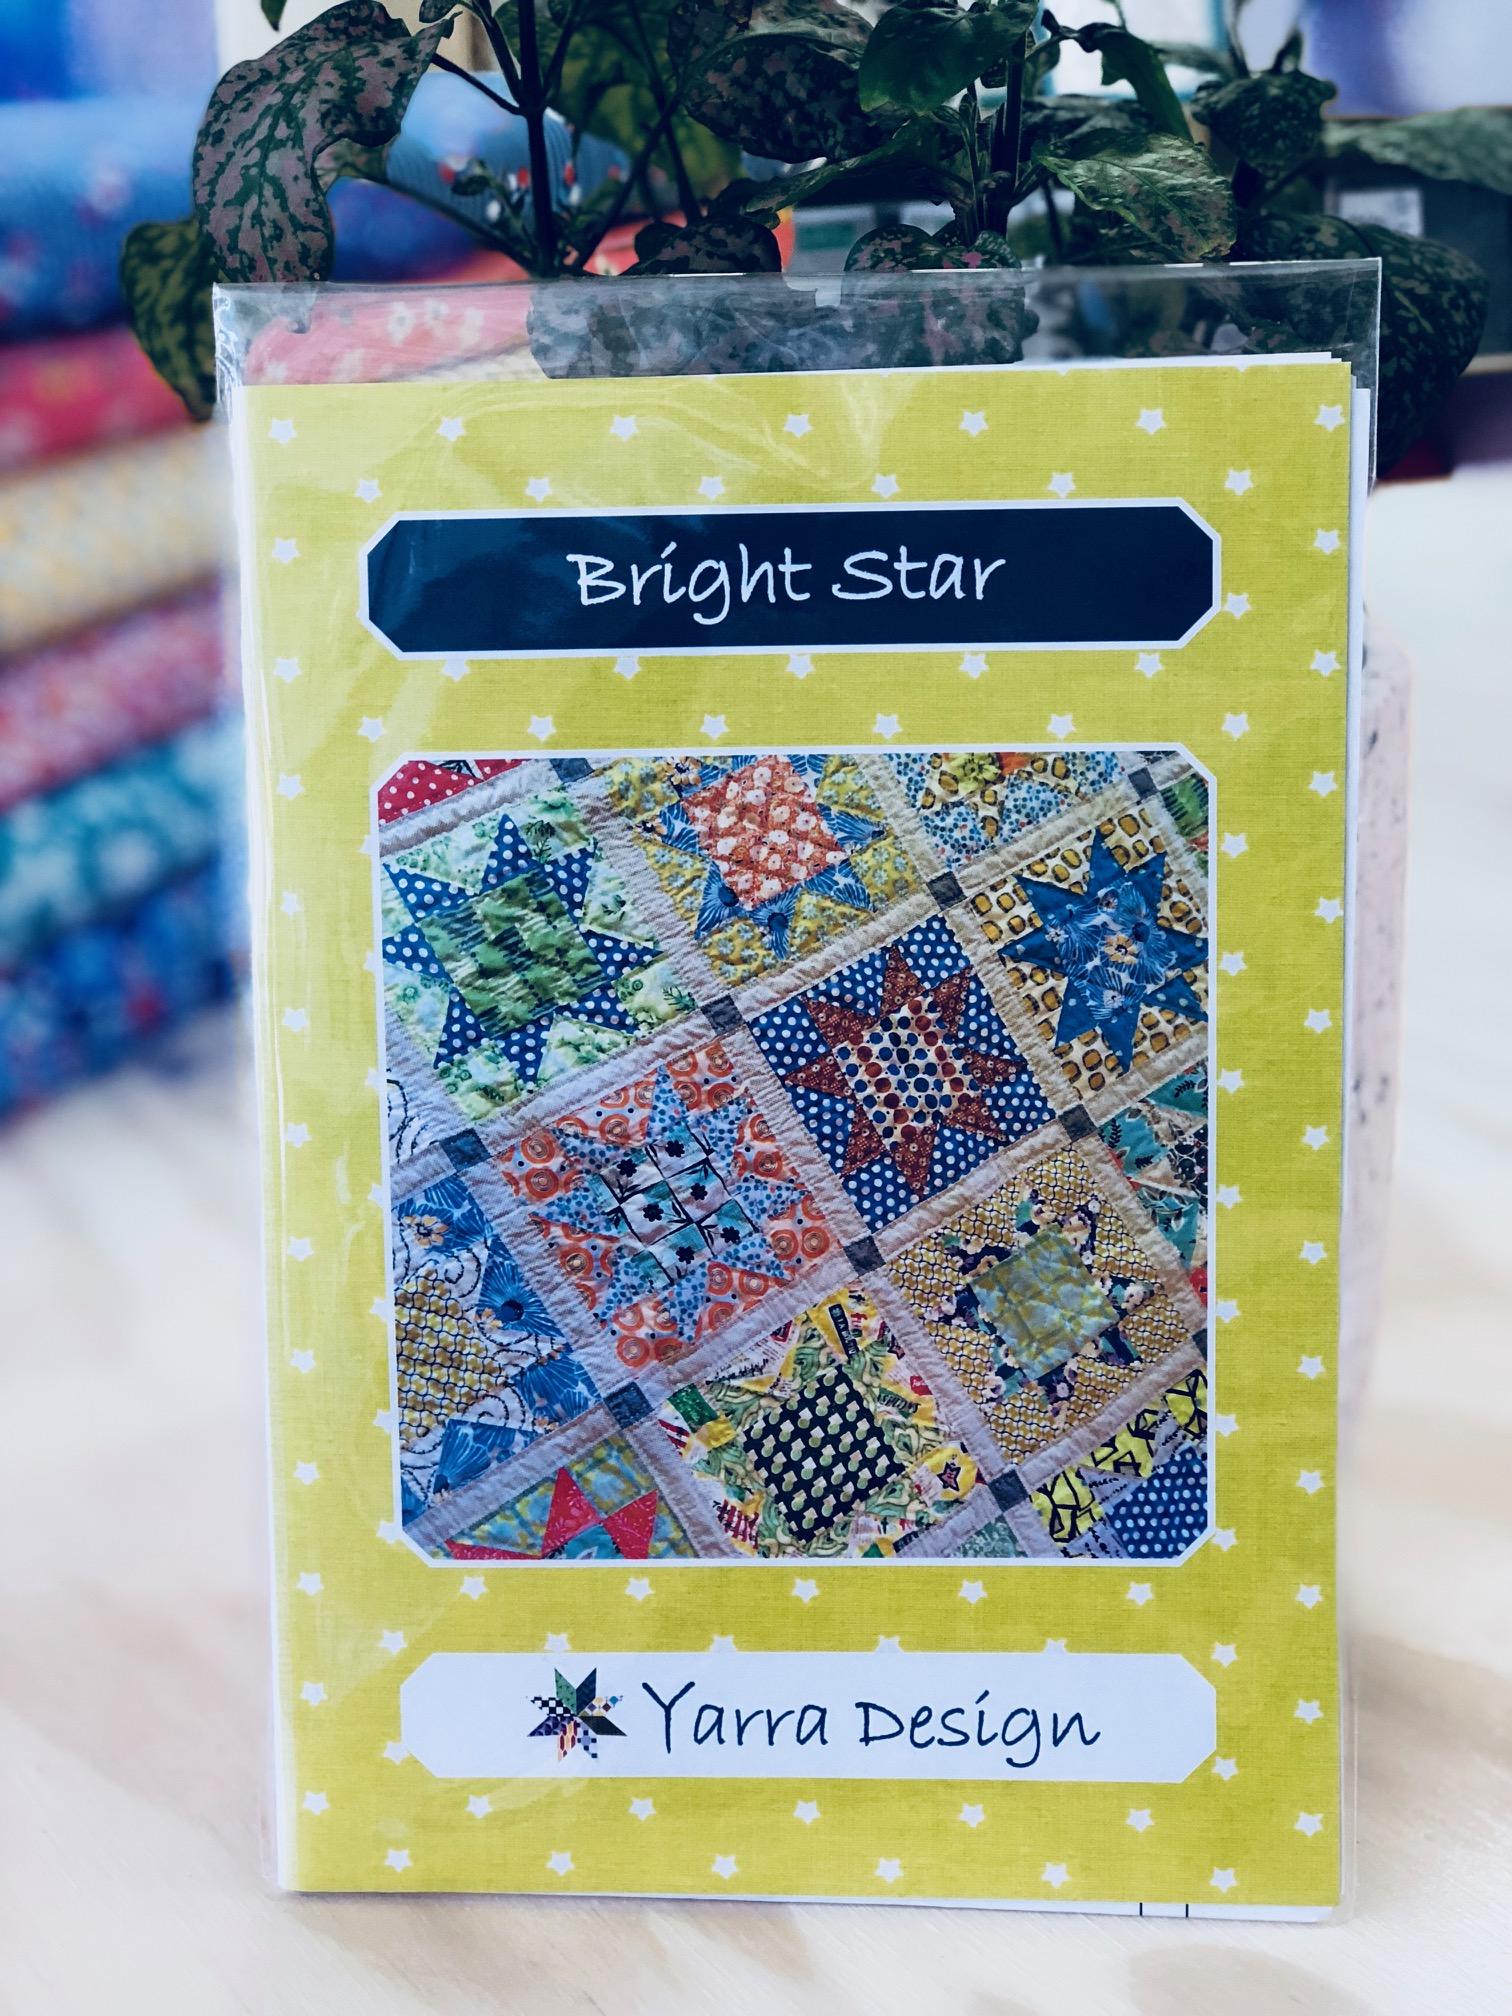 Yarra Design - Bright Star